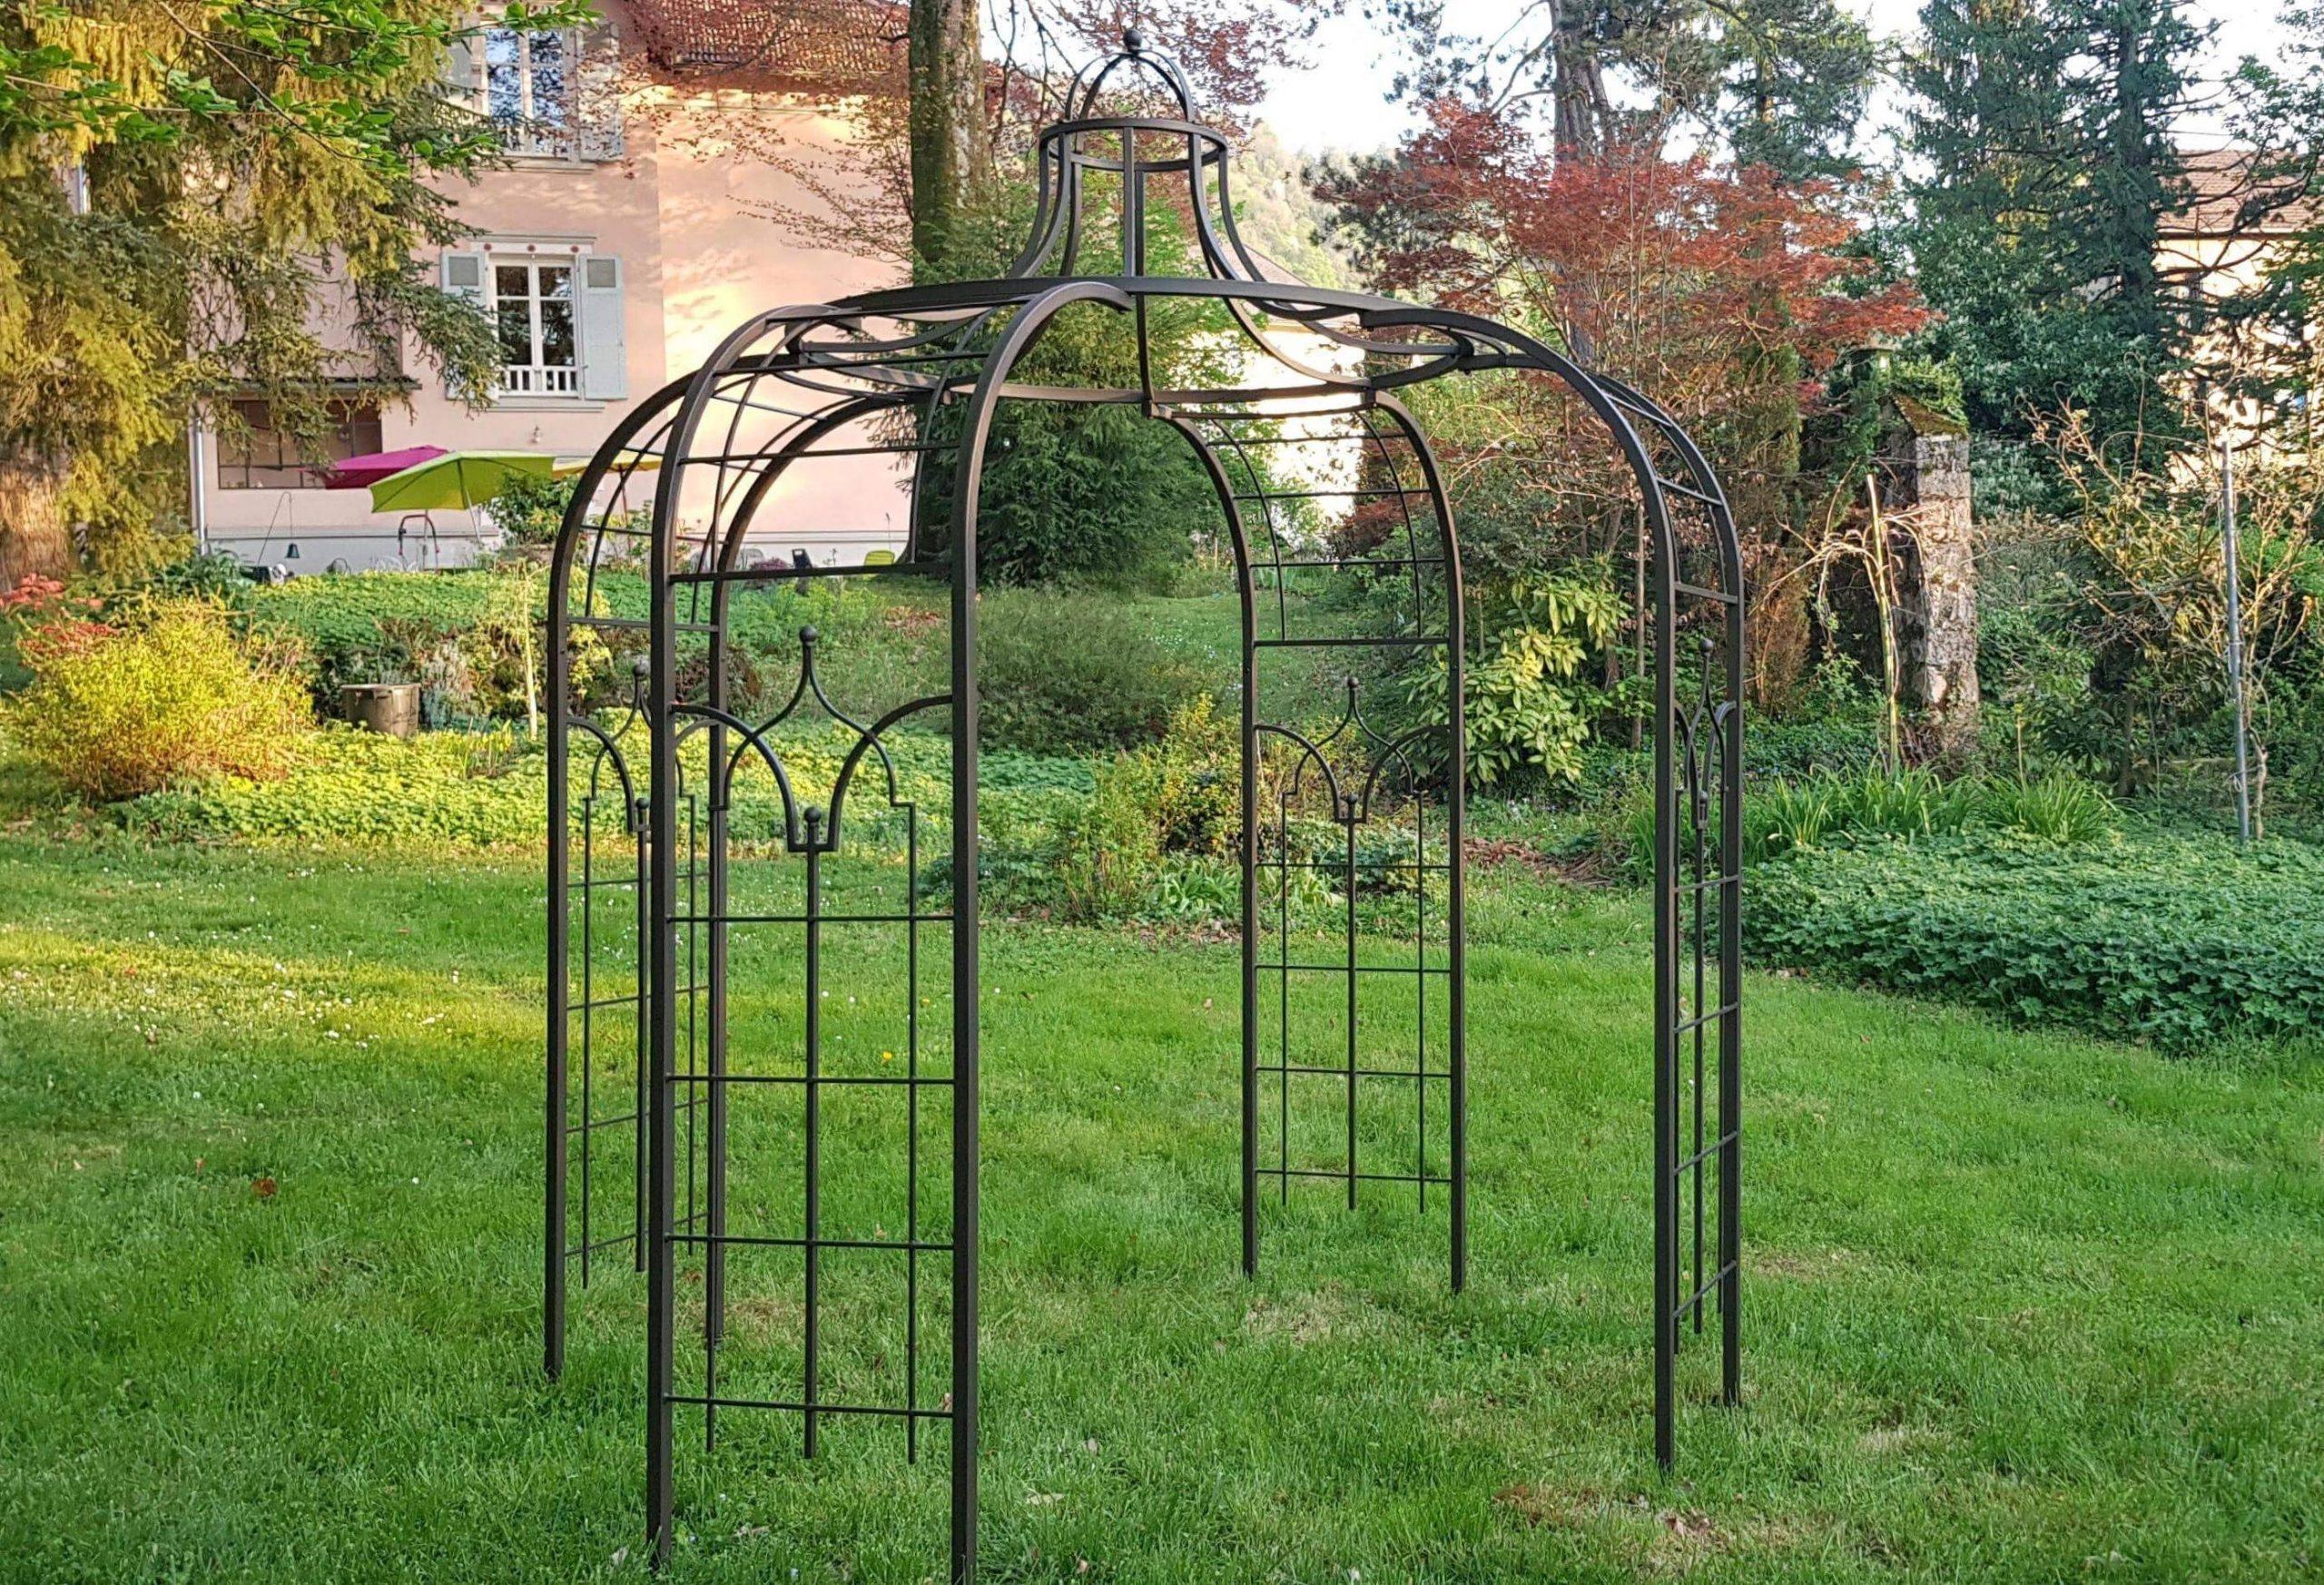 Gloriette Princess Medium Tonnelle Pergola De Jardin Abris ... destiné Arche De Jardin En Fer Forgé